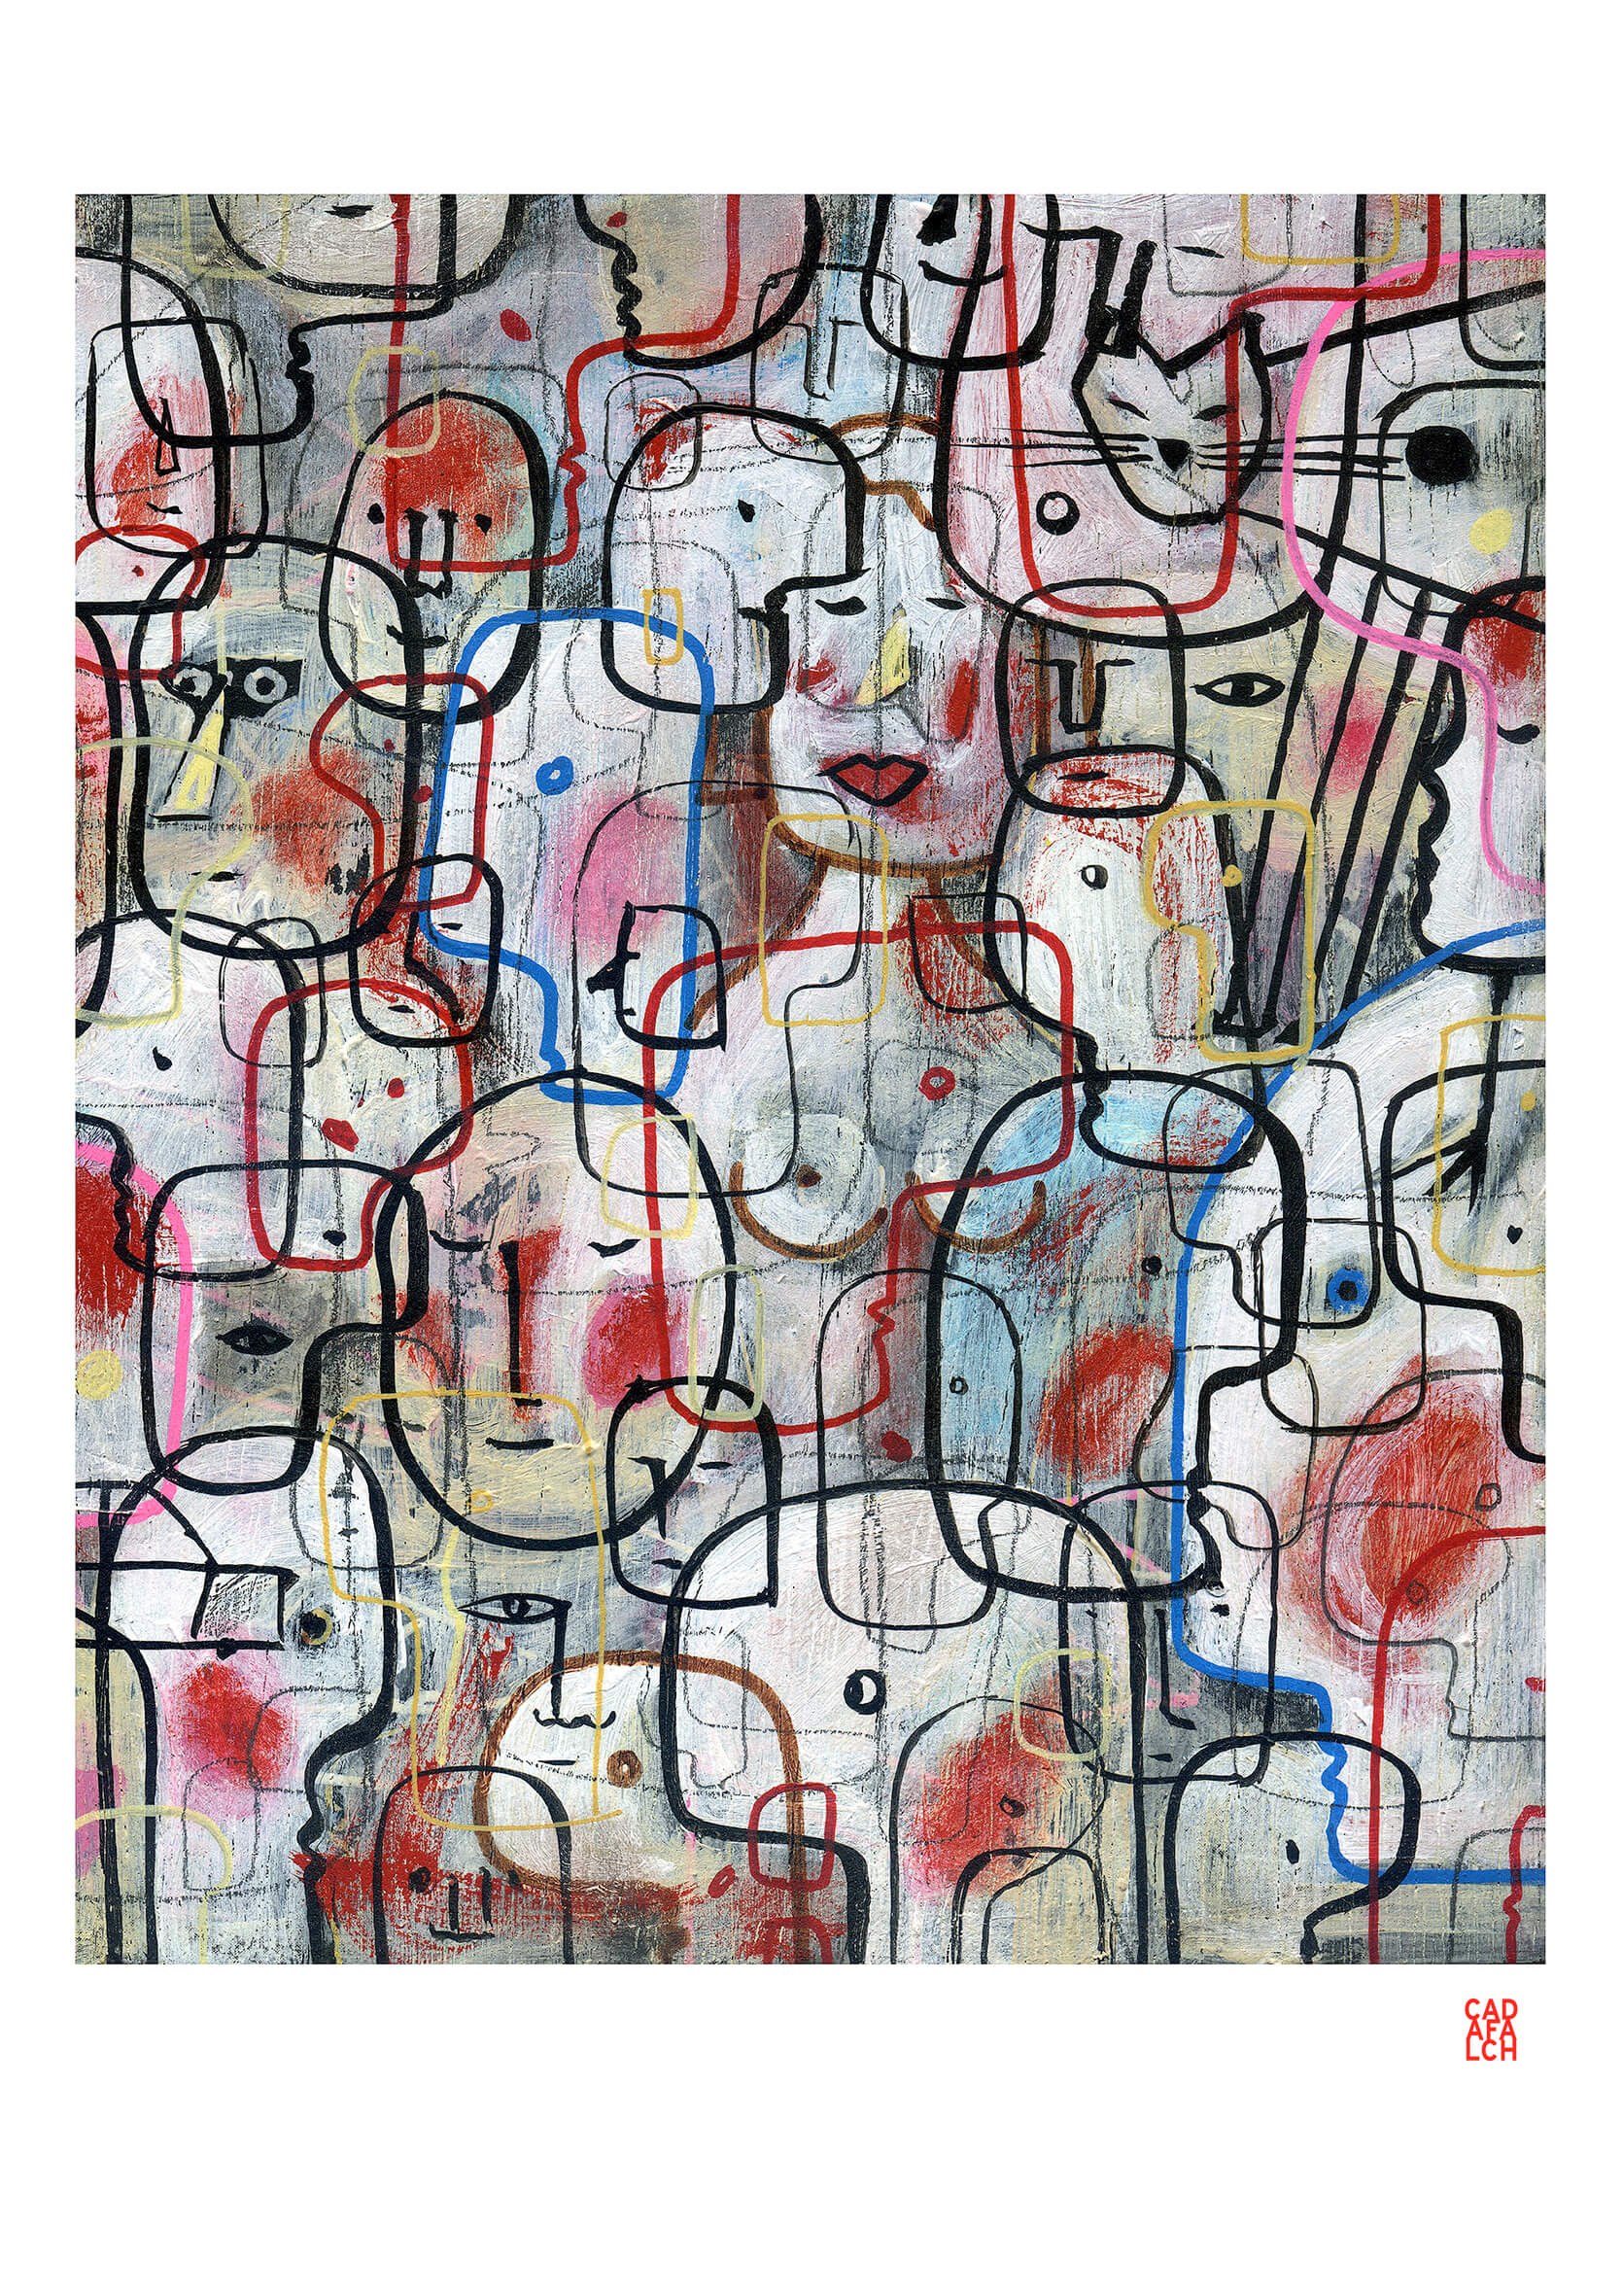 05.Futur2-A3 Lluís Cadafalch - Obra gràfica